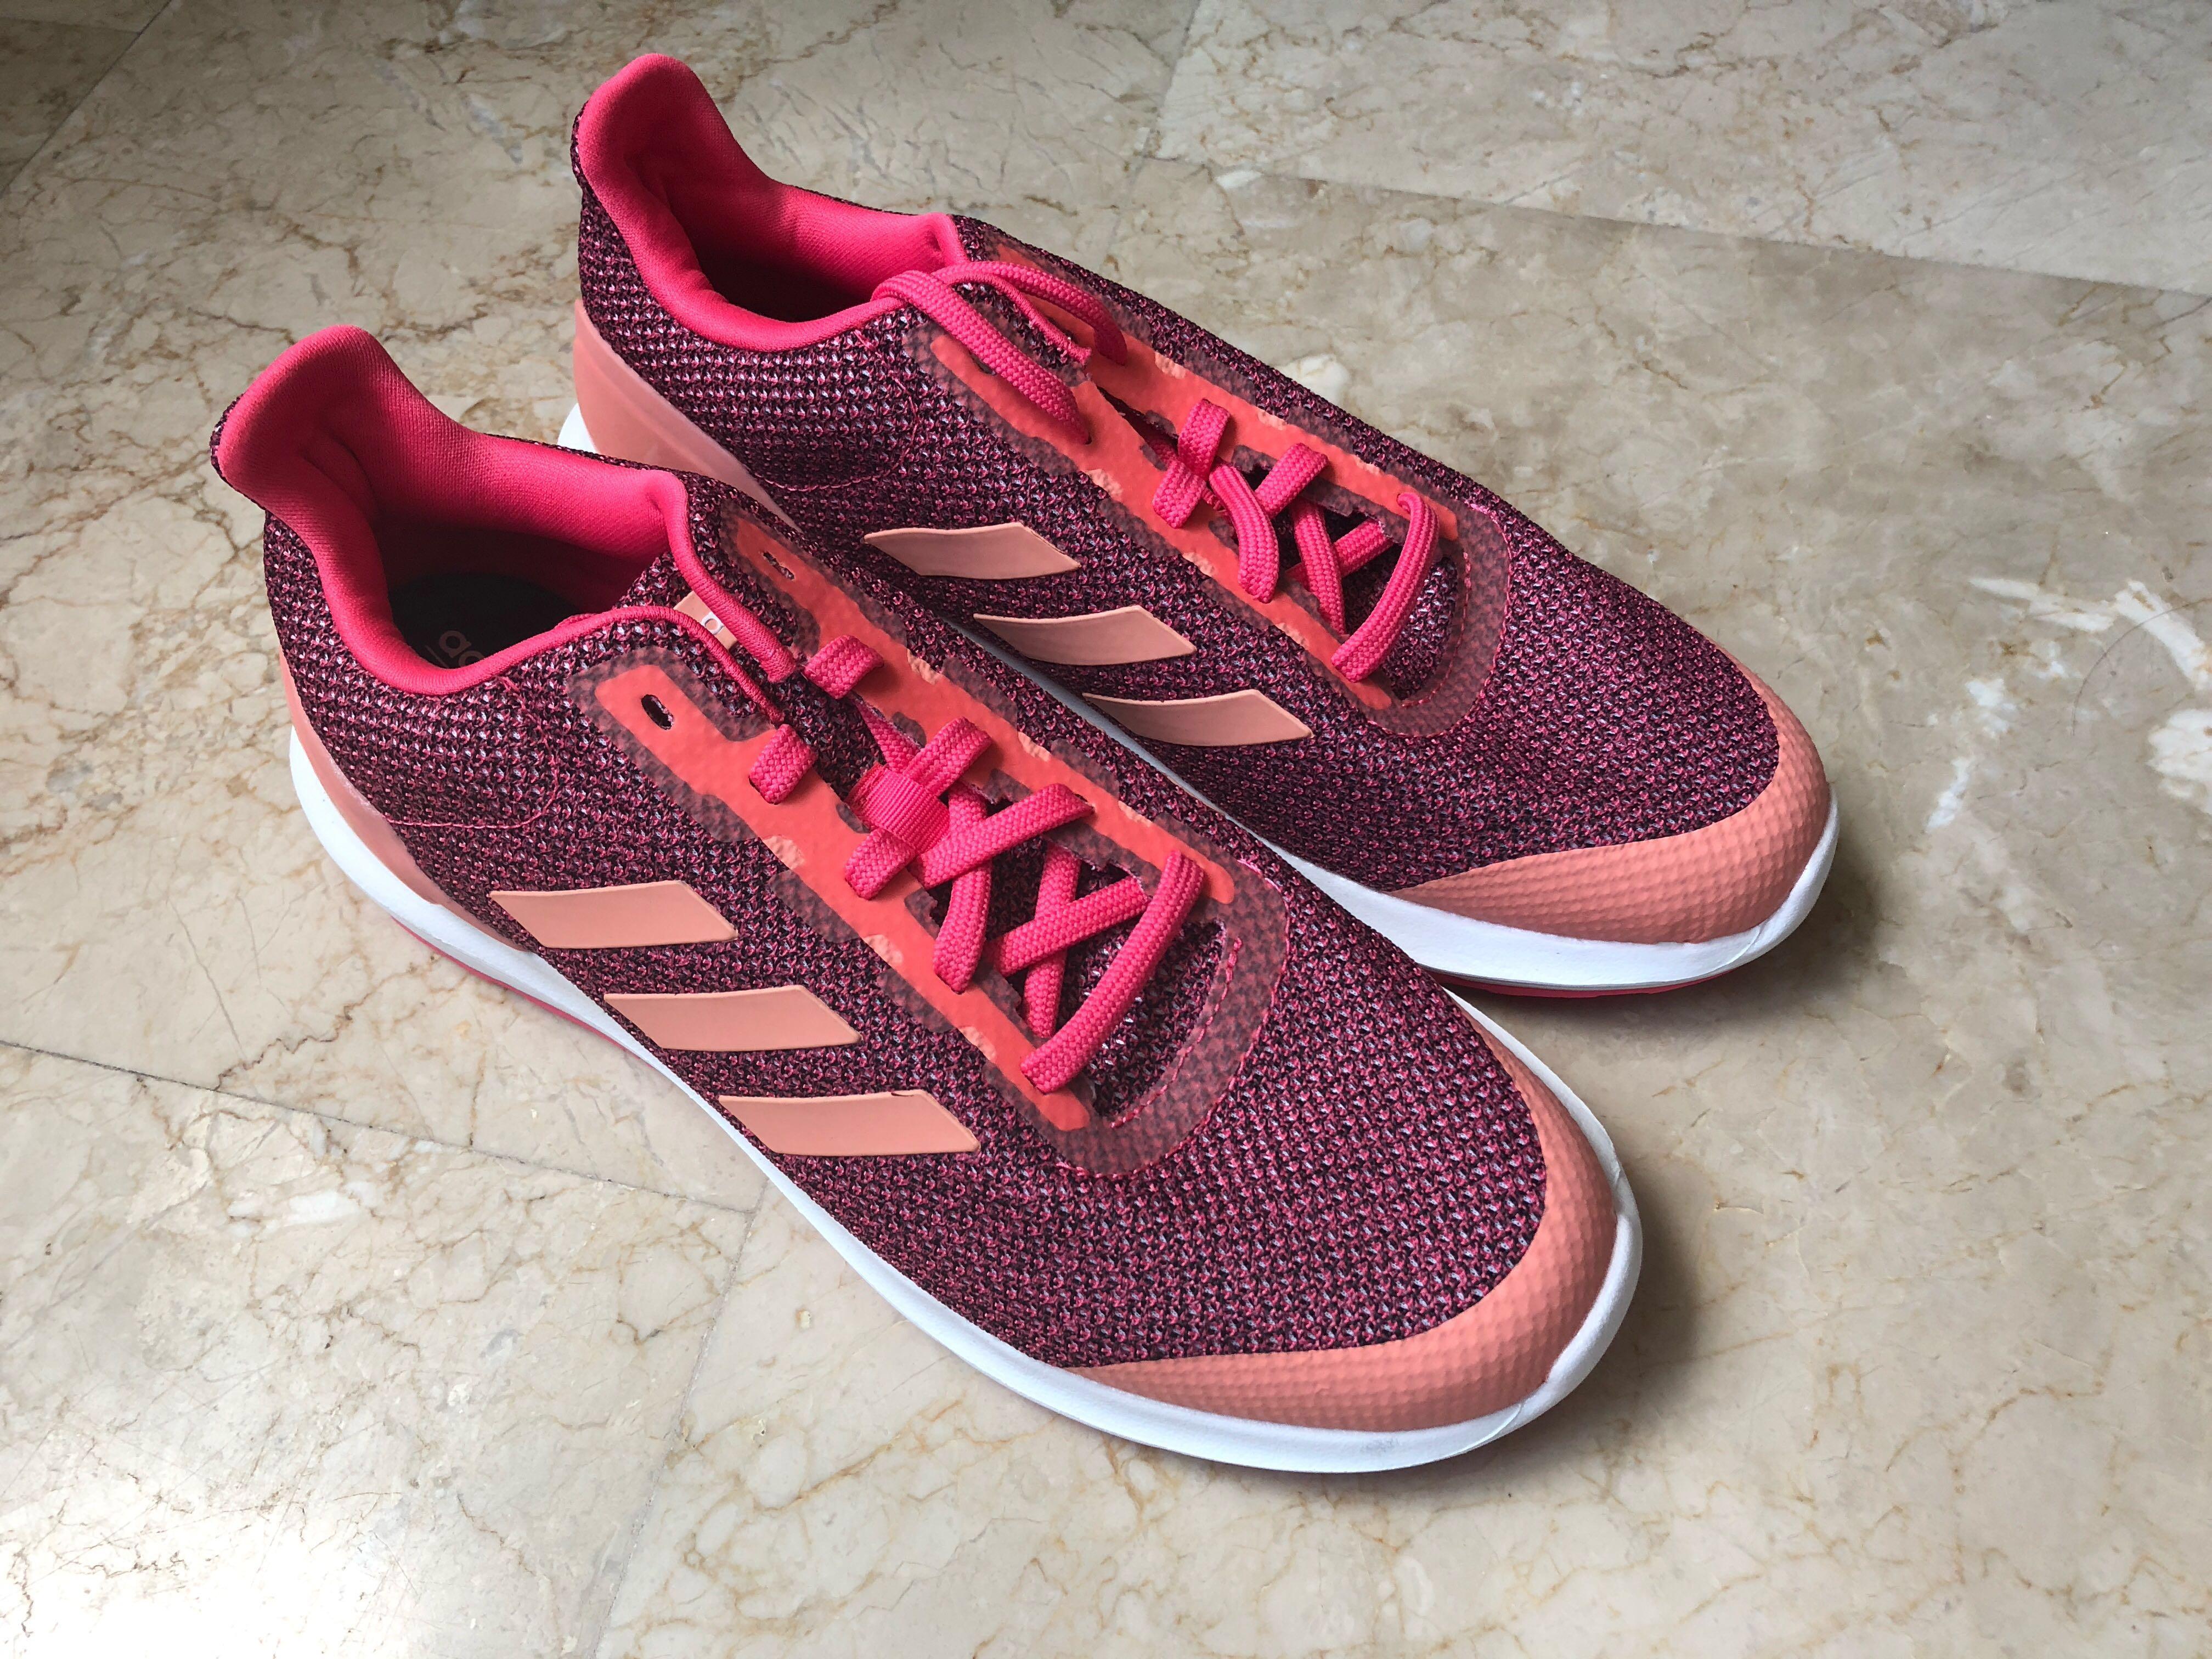 Adidas Eco Ortholite Shoes Size 40 39d86a11b